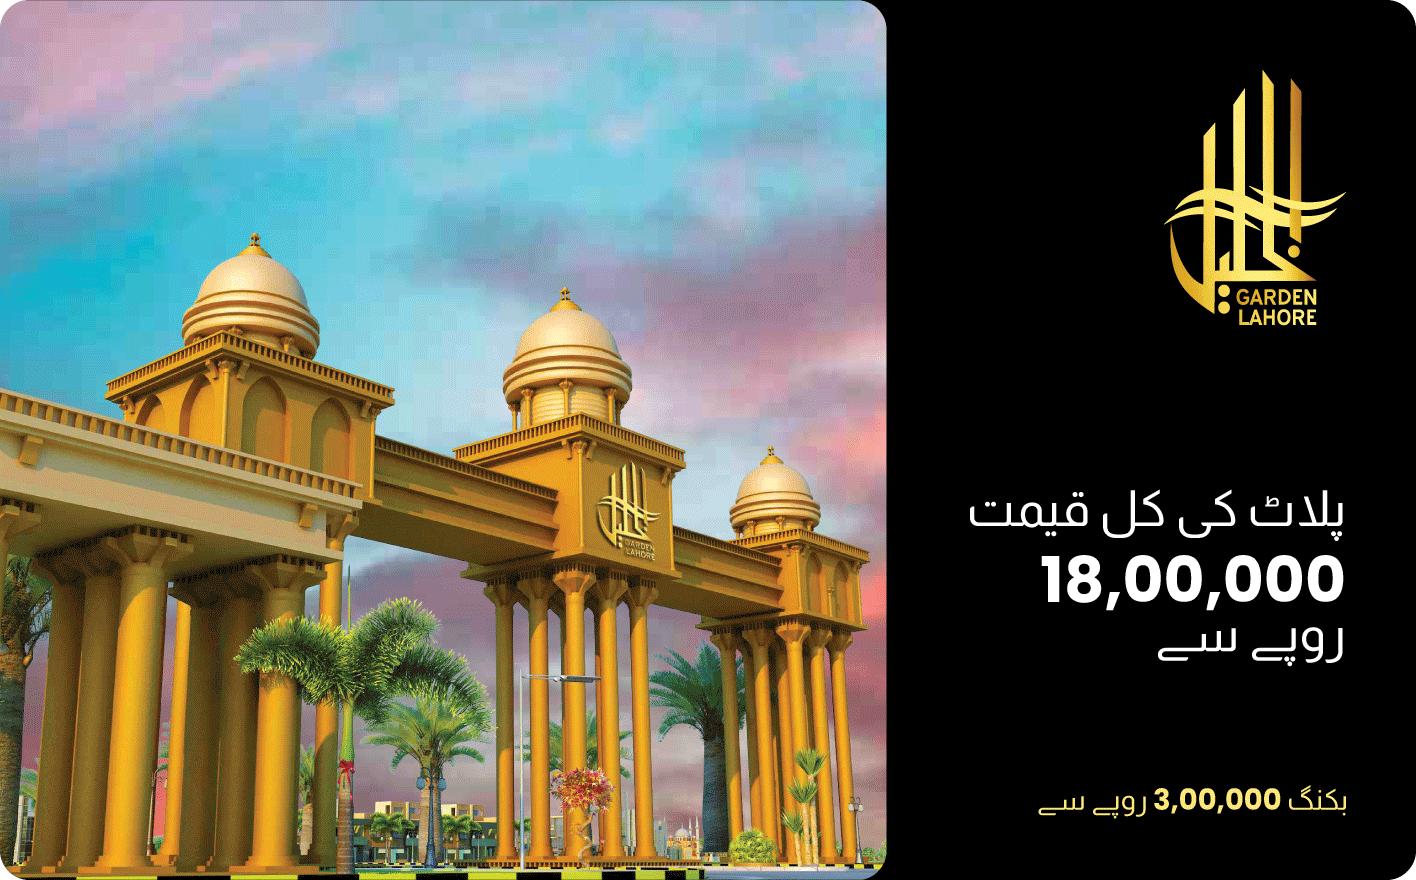 Al Khalil Garden Lahore, Plots Available on Easy Installments